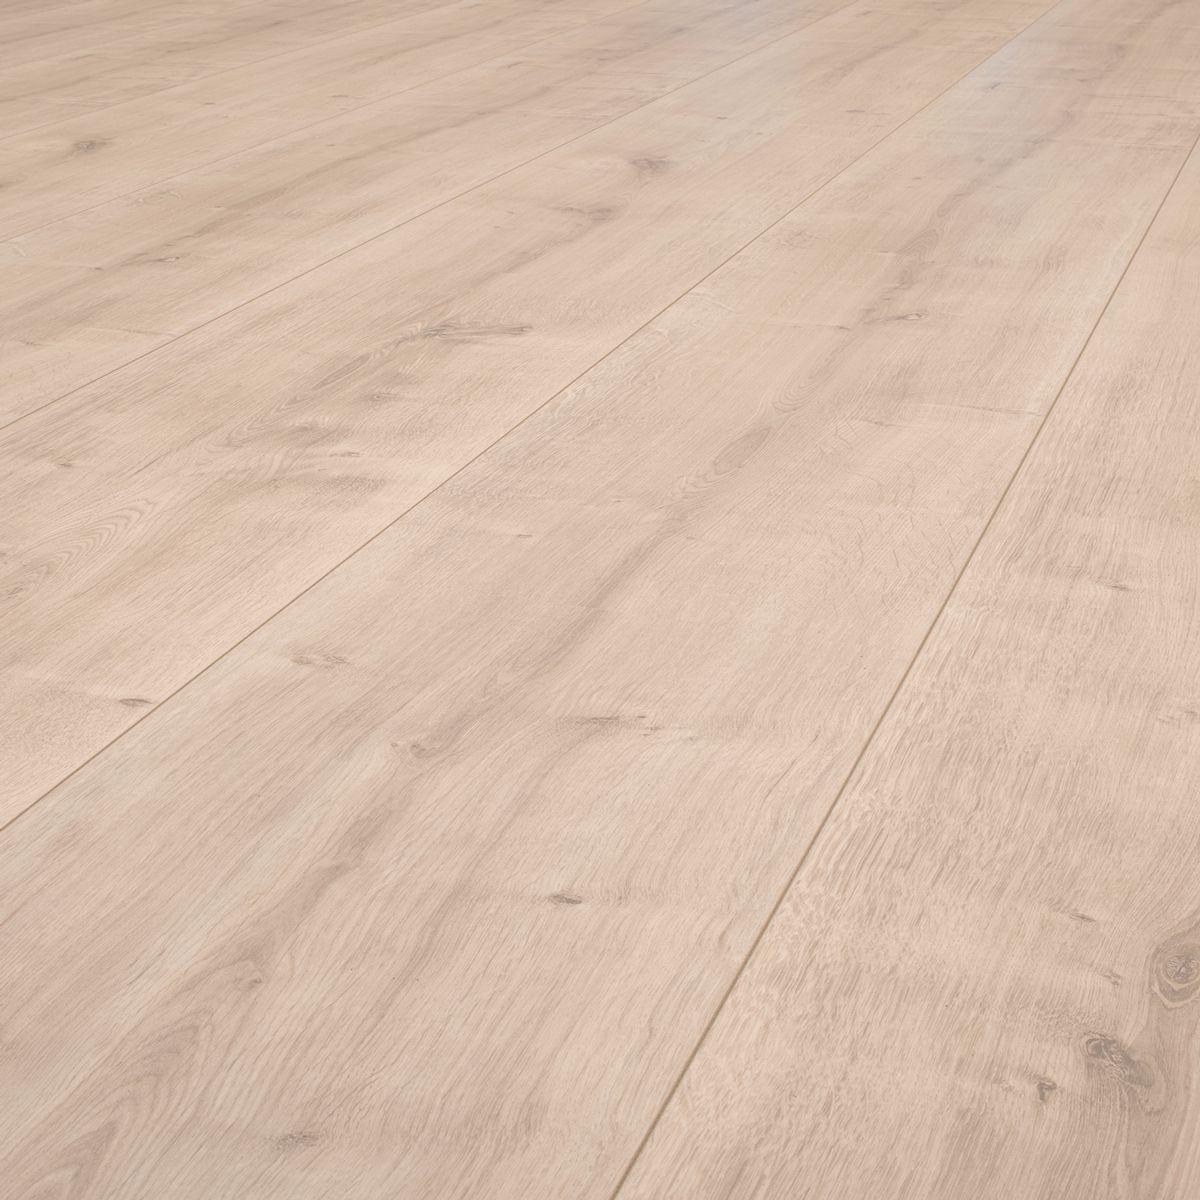 laminaat vloer quickstep impressive meister eiken wit grijs